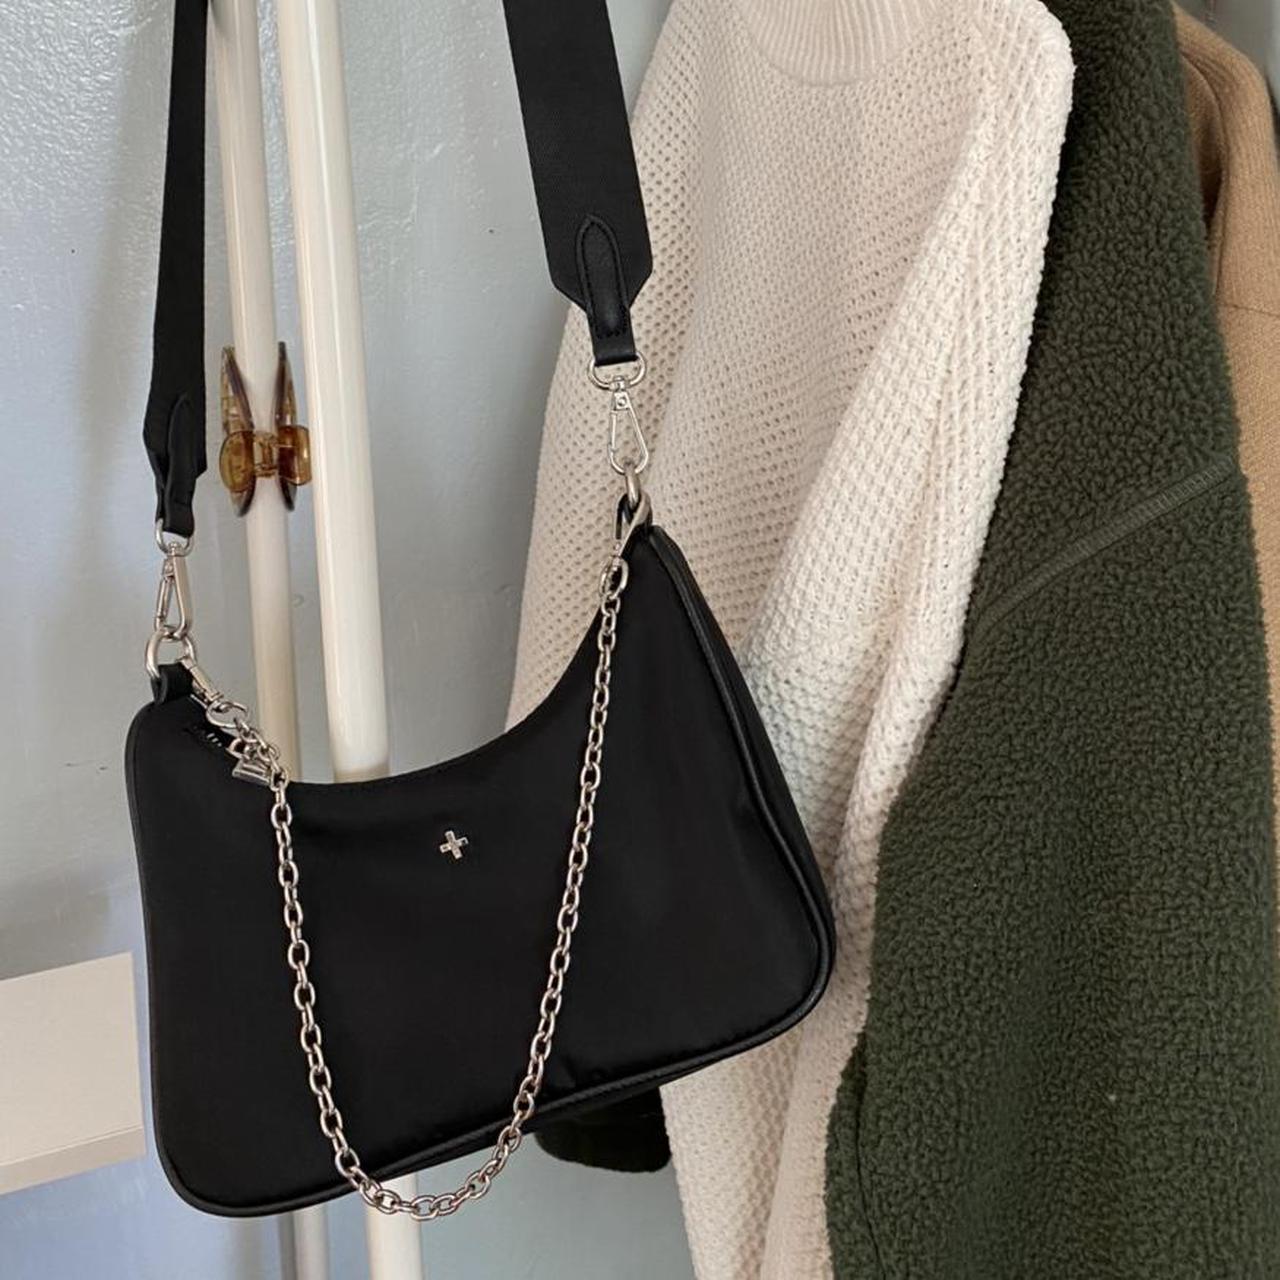 Product Image 1 - peta and jain purse